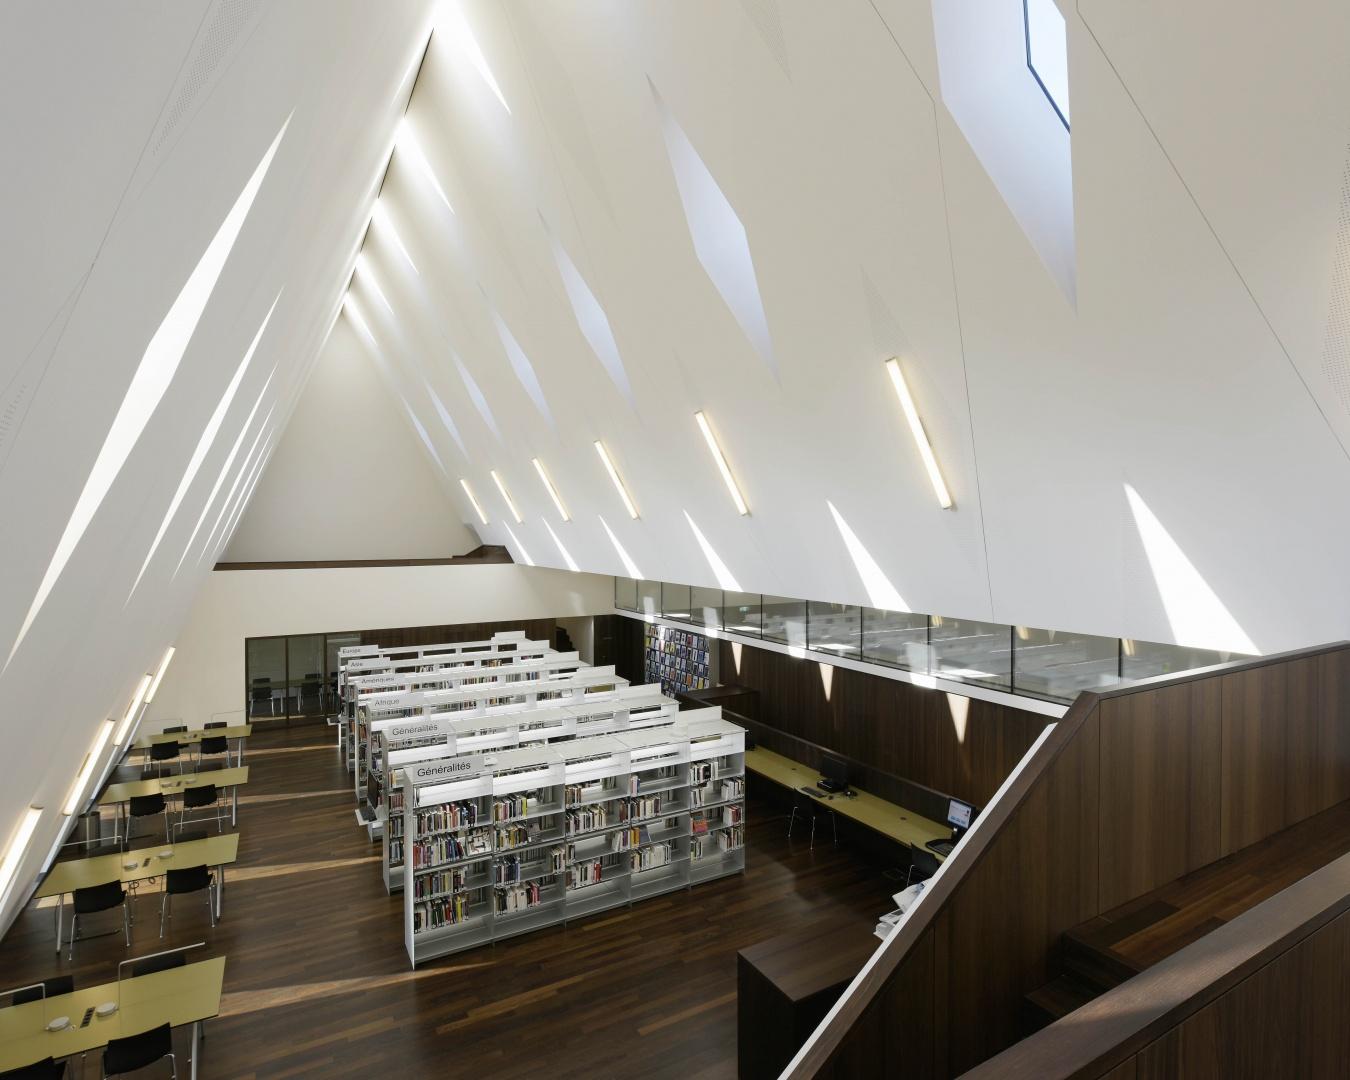 Bibliothek © Leo Fabrizio, Lausanne